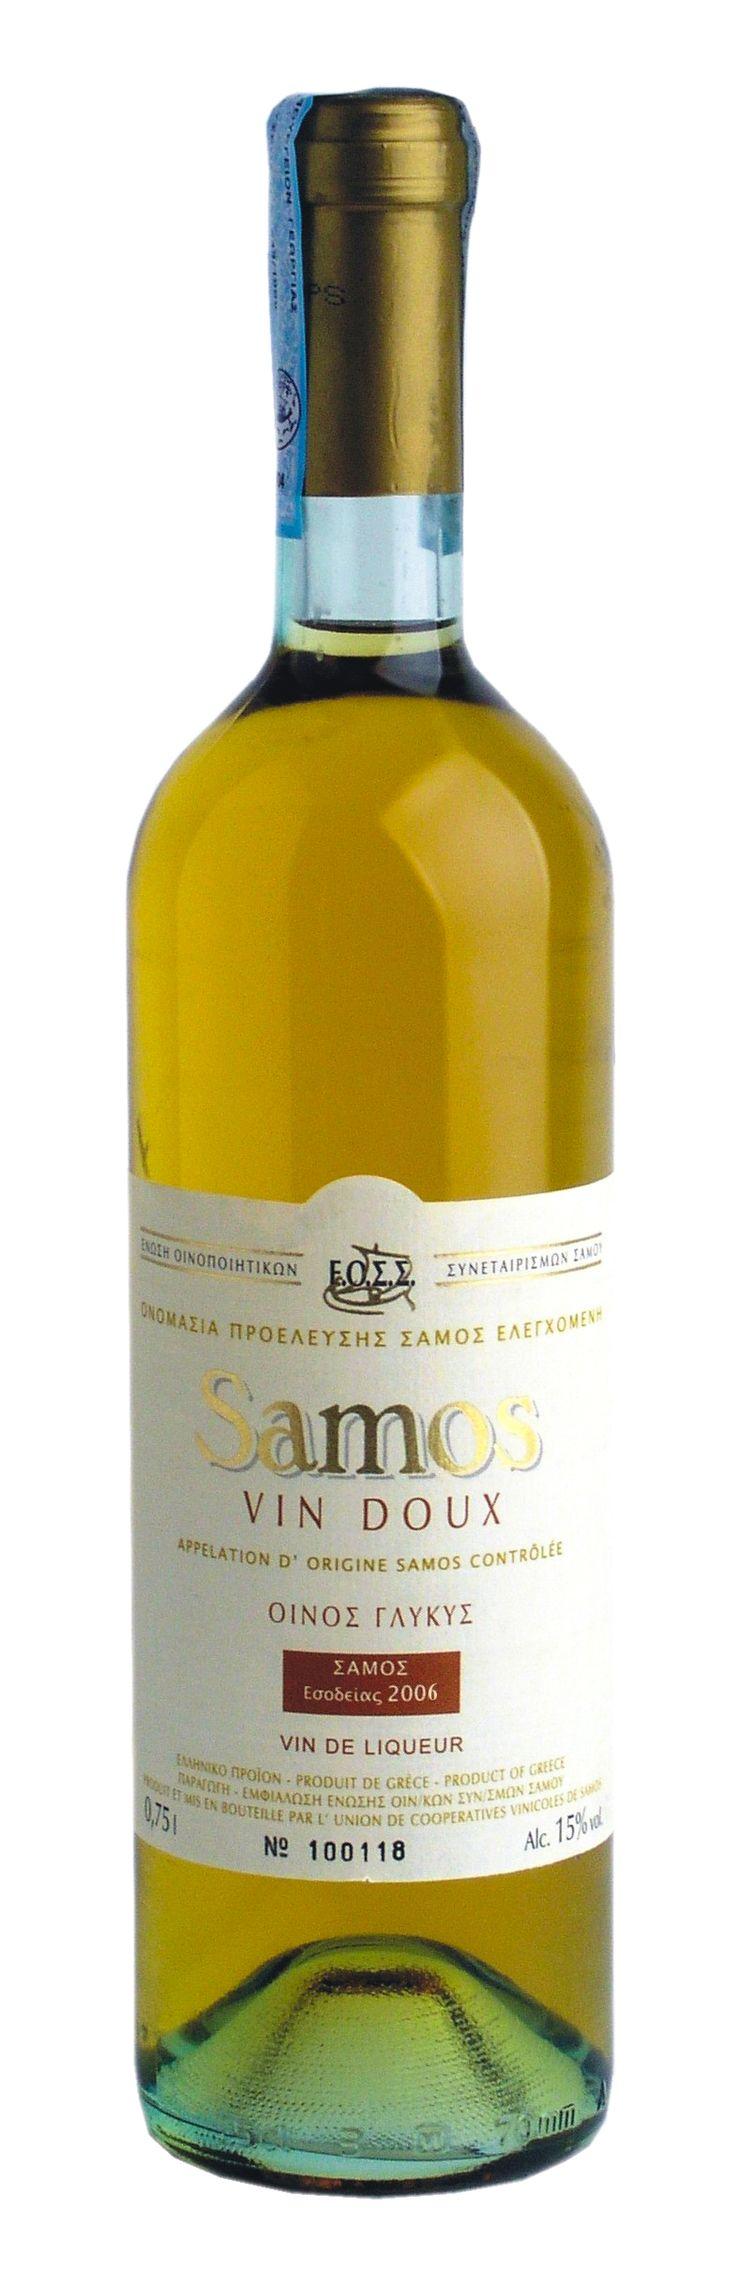 VIN DOUX - Samos wine